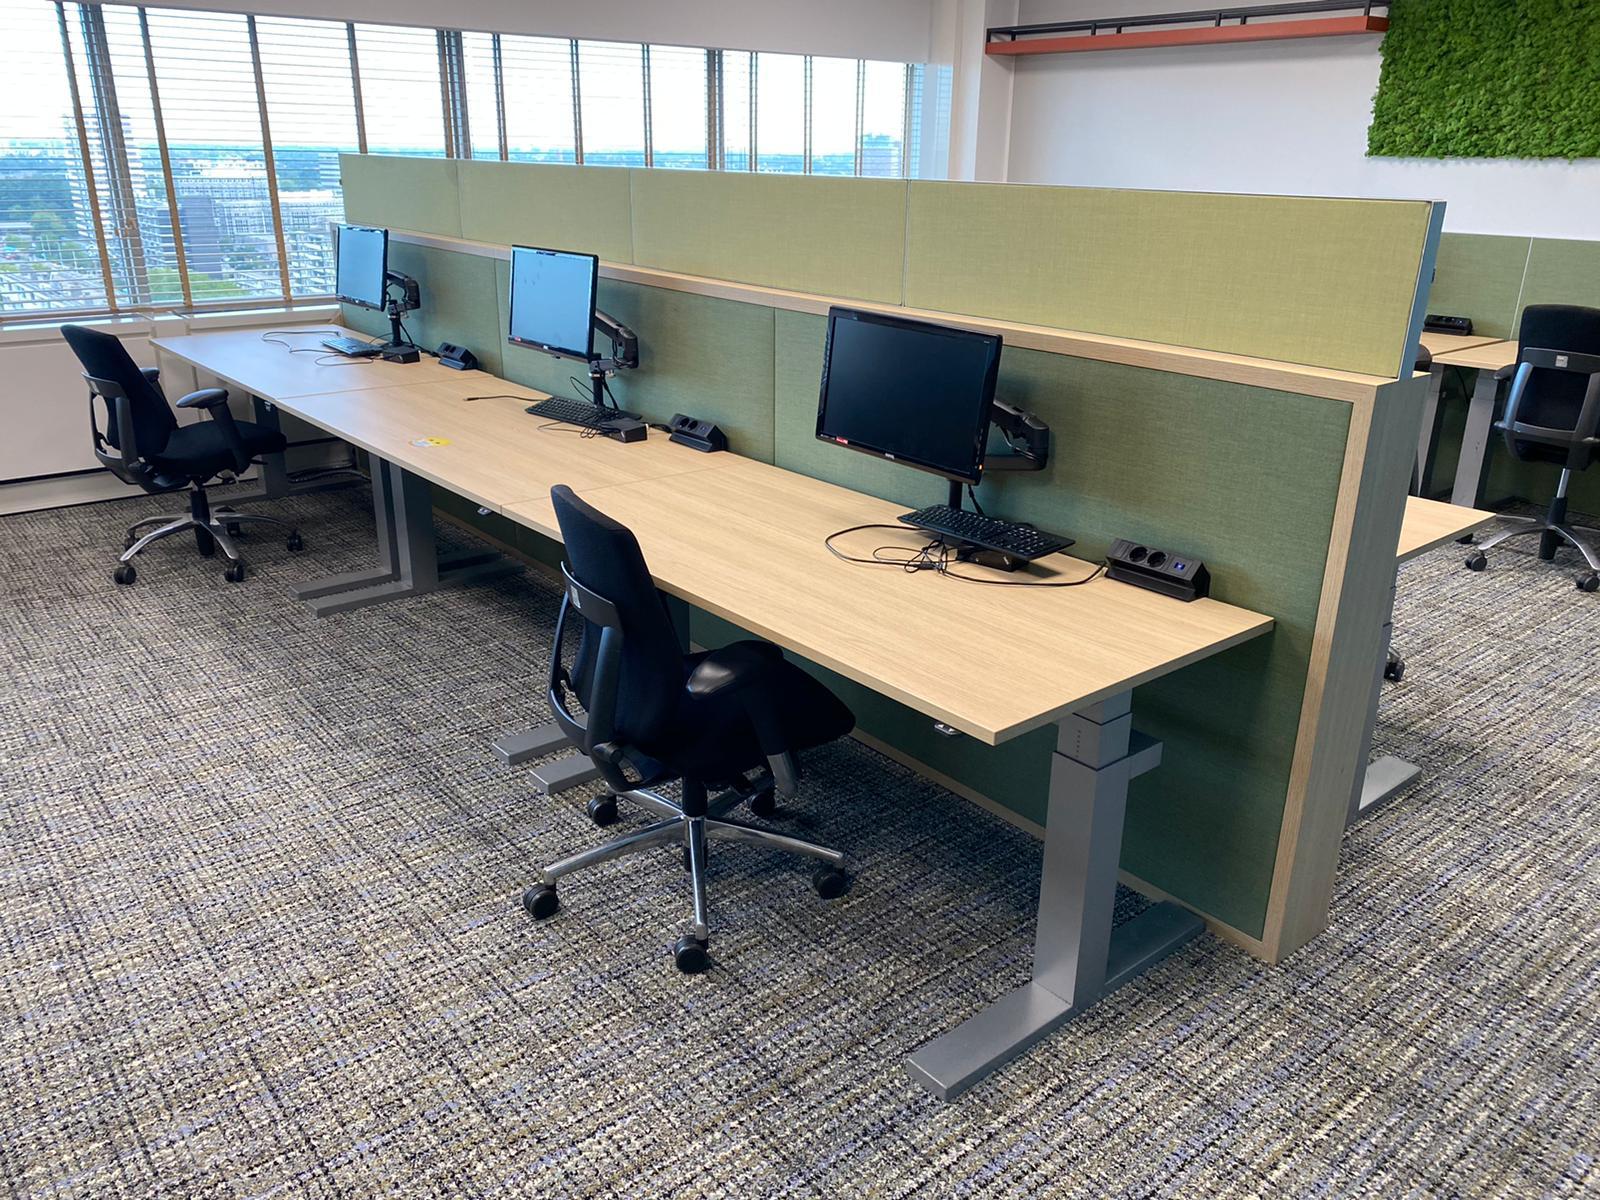 Sekondant - elektrificatie - flexible monitor arm - stroomkabel - ergonomische werkplek